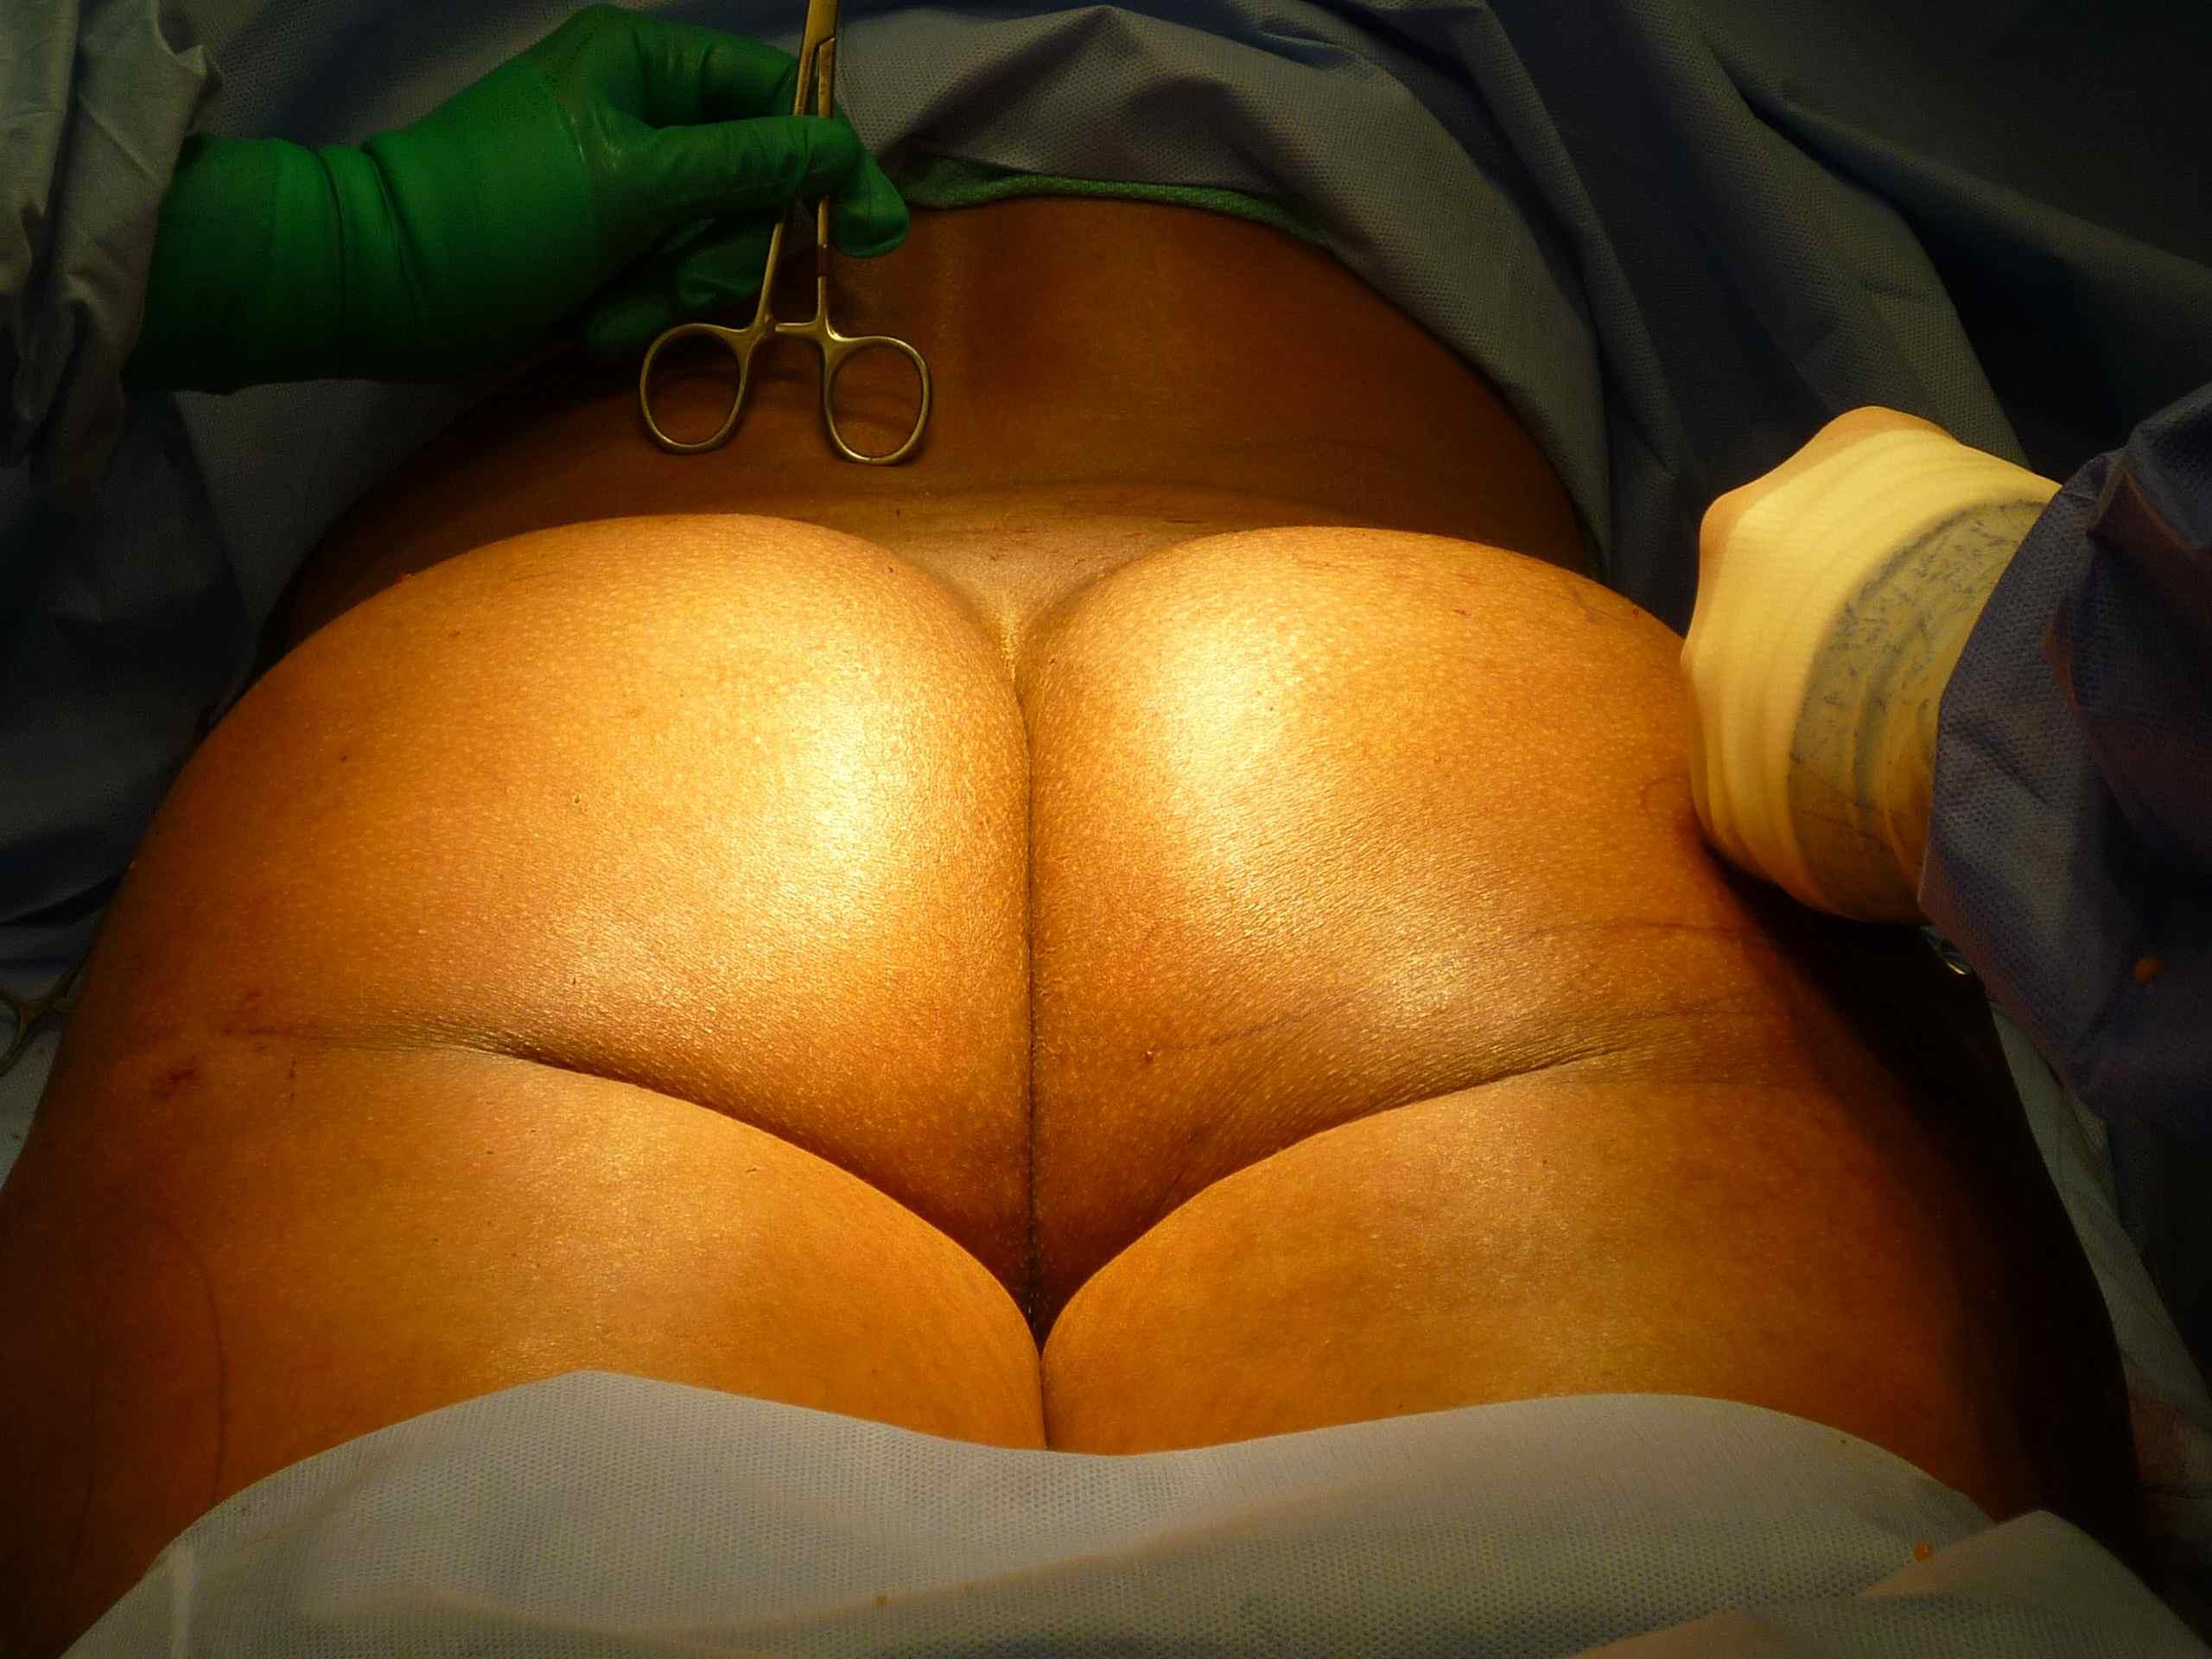 butt-implants-pics